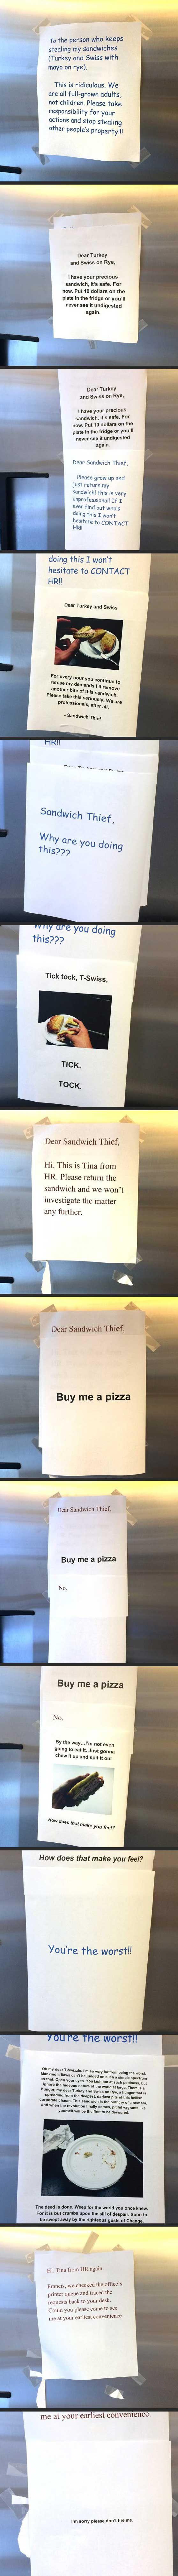 Sandwich Thief